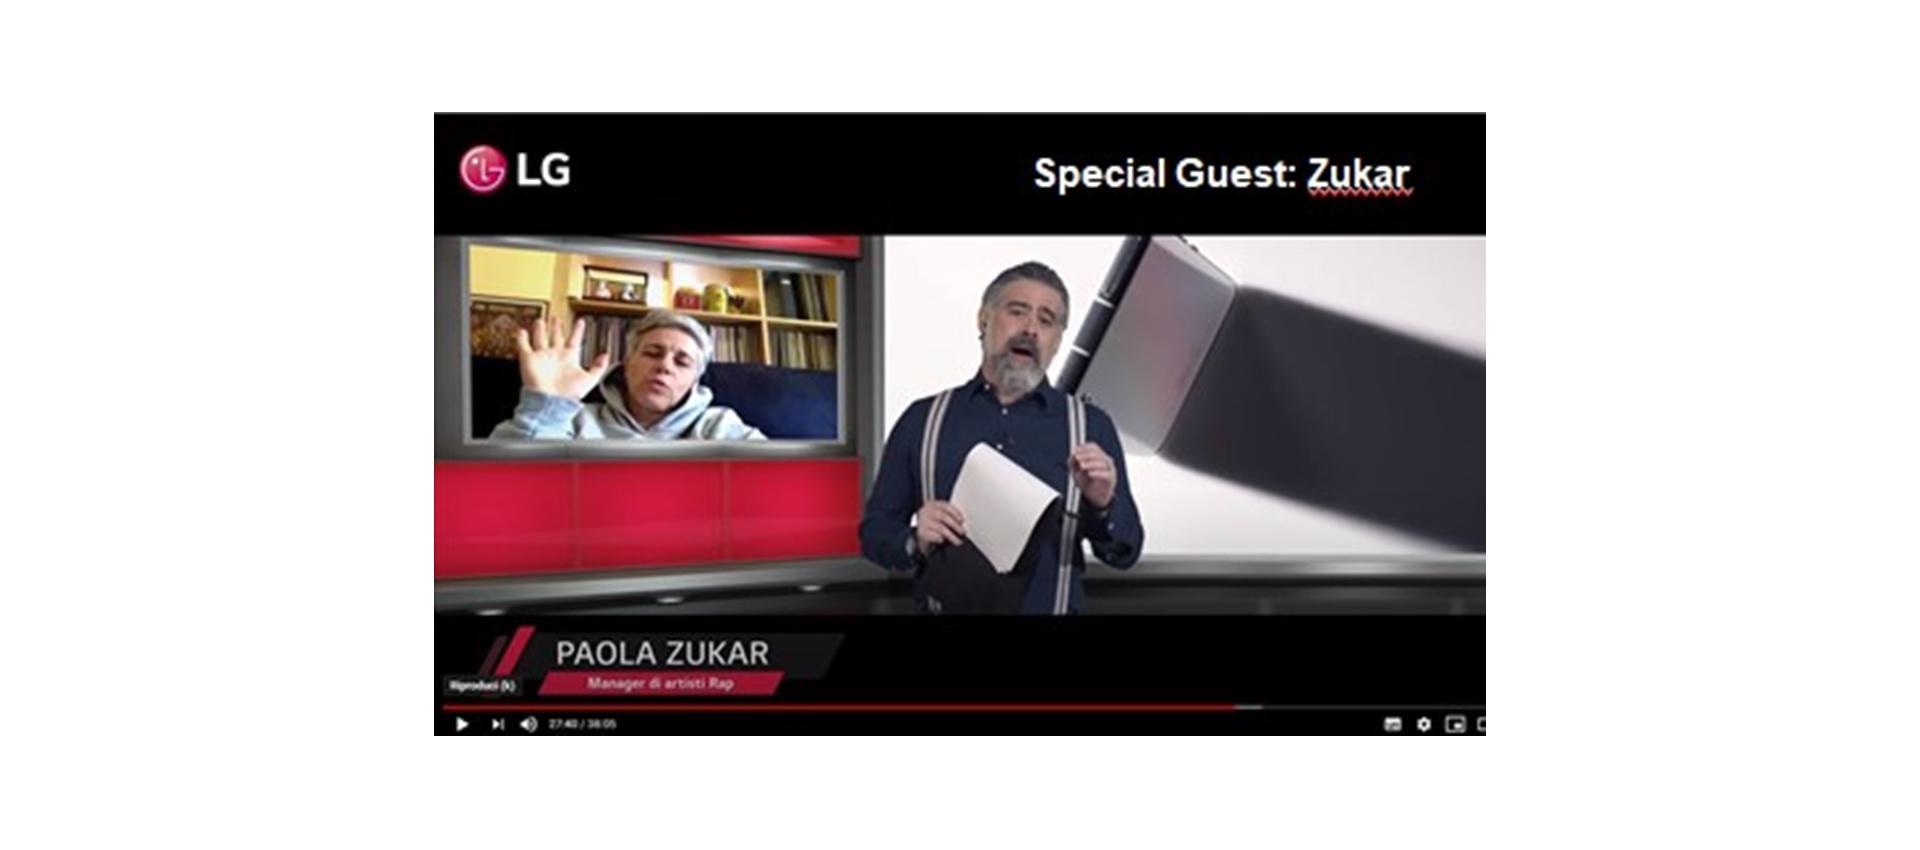 LG 스마트폰, 글로벌 시장에서 언택트(Untact) 마케팅 강화